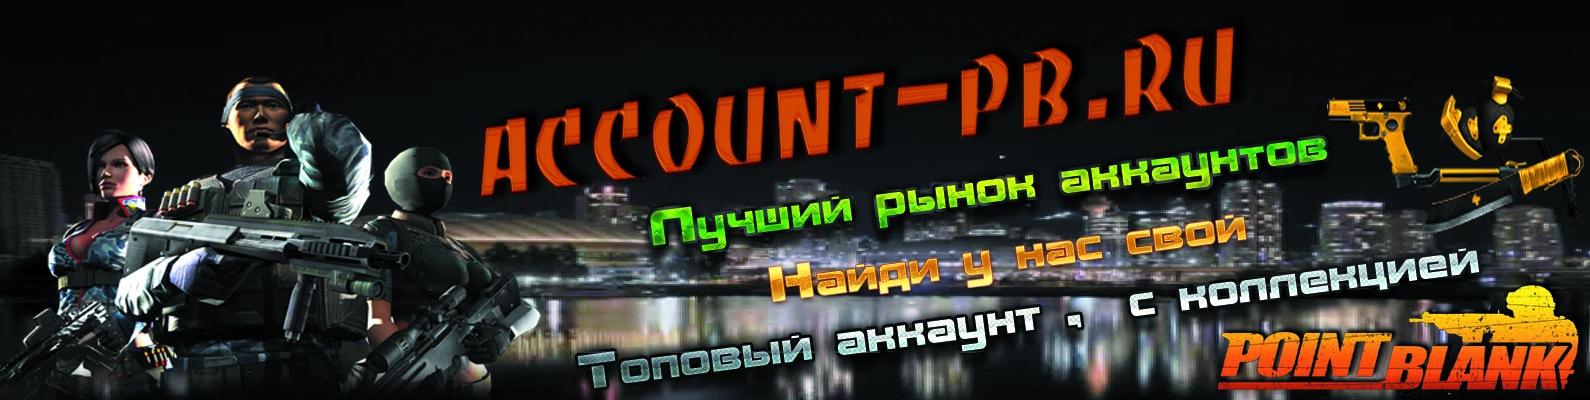 Account Pb Ru Vk